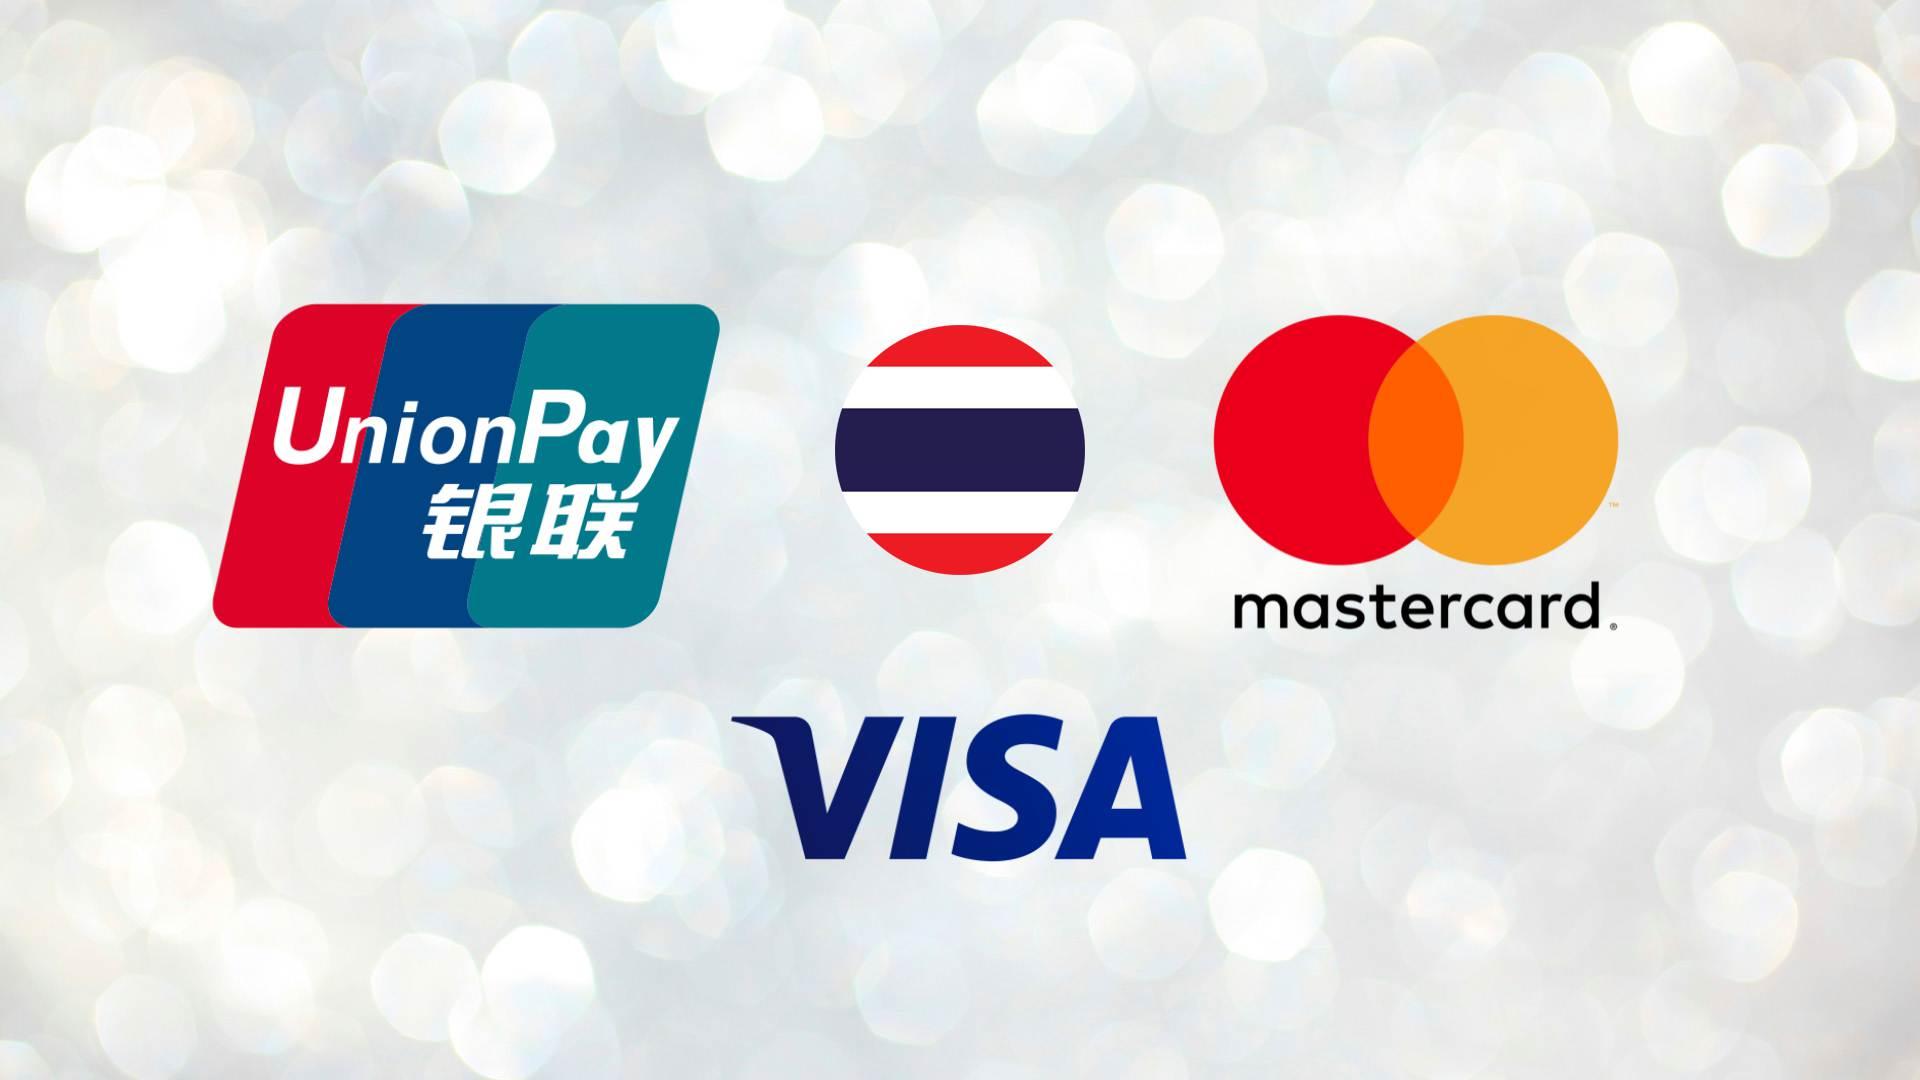 unionpay mastercard visa